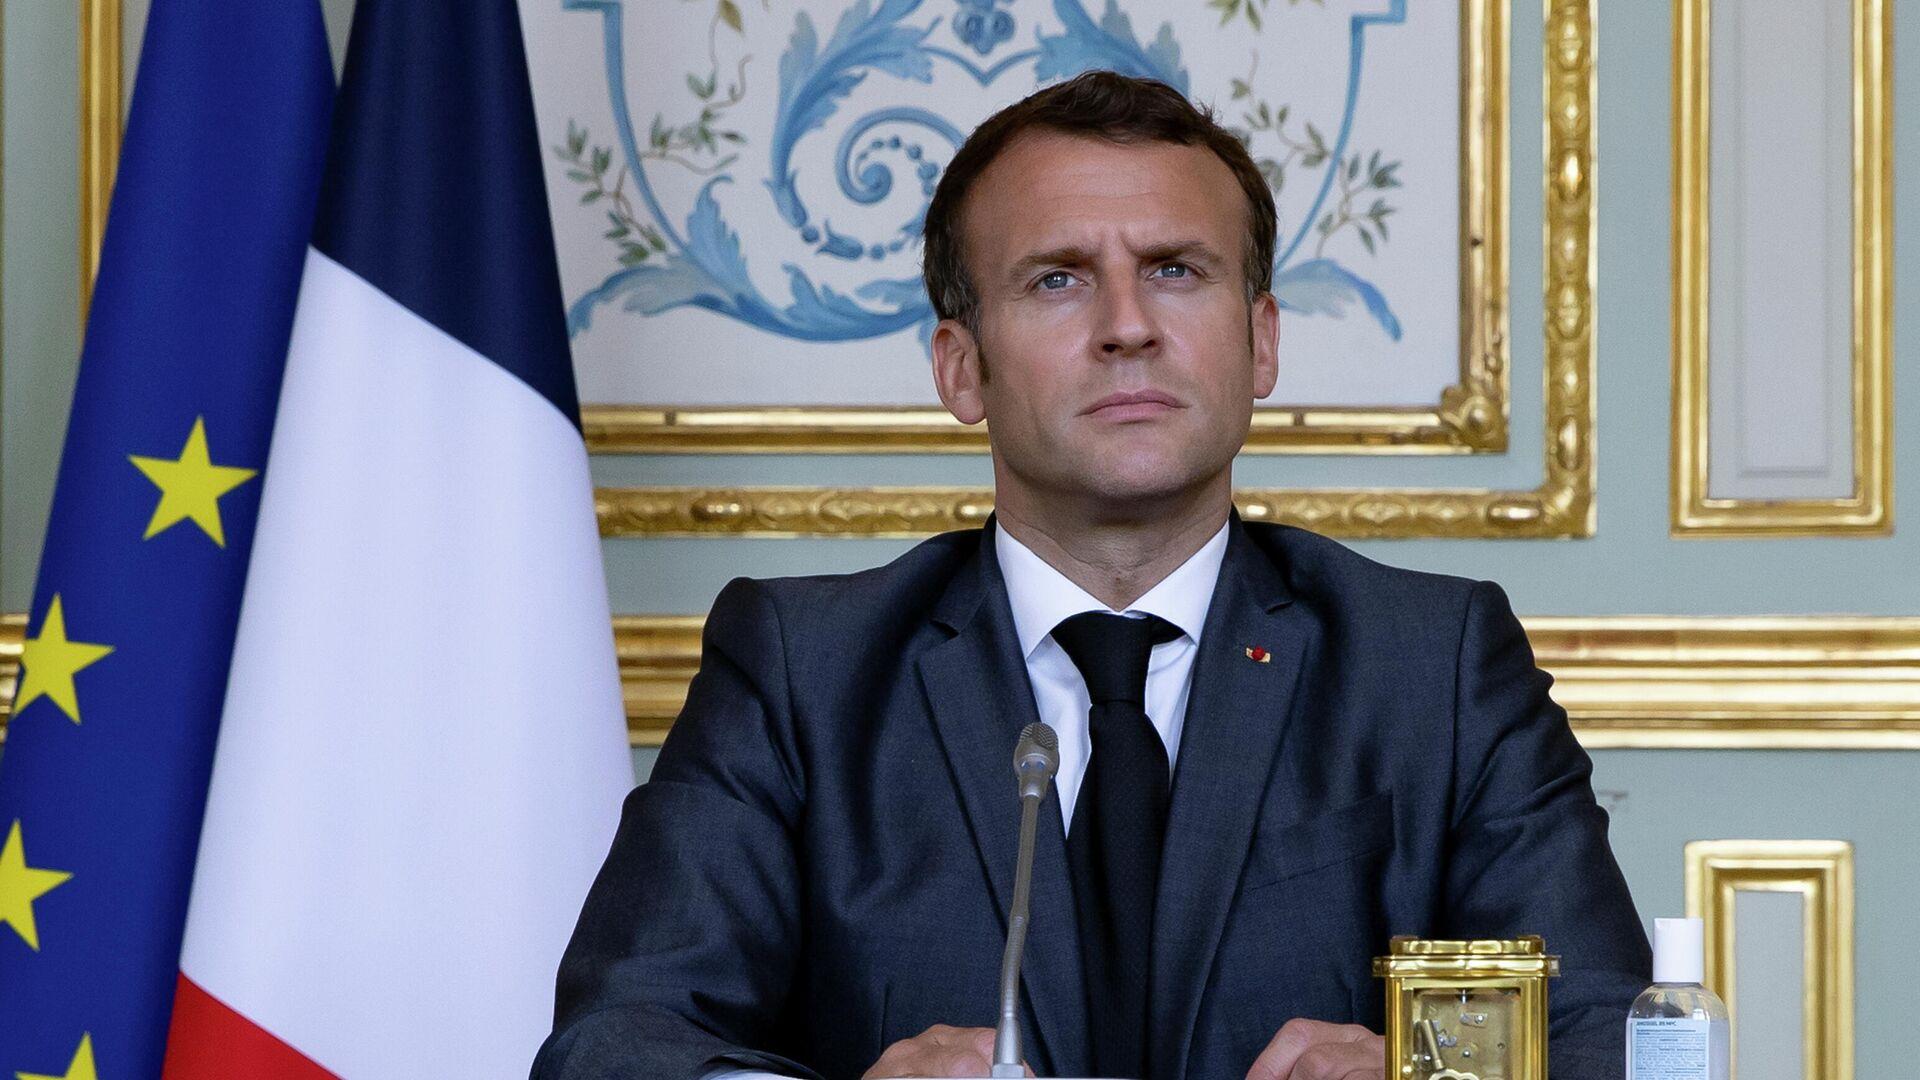 Emmanuel Macron, presidente de Francia - Sputnik Mundo, 1920, 25.05.2021